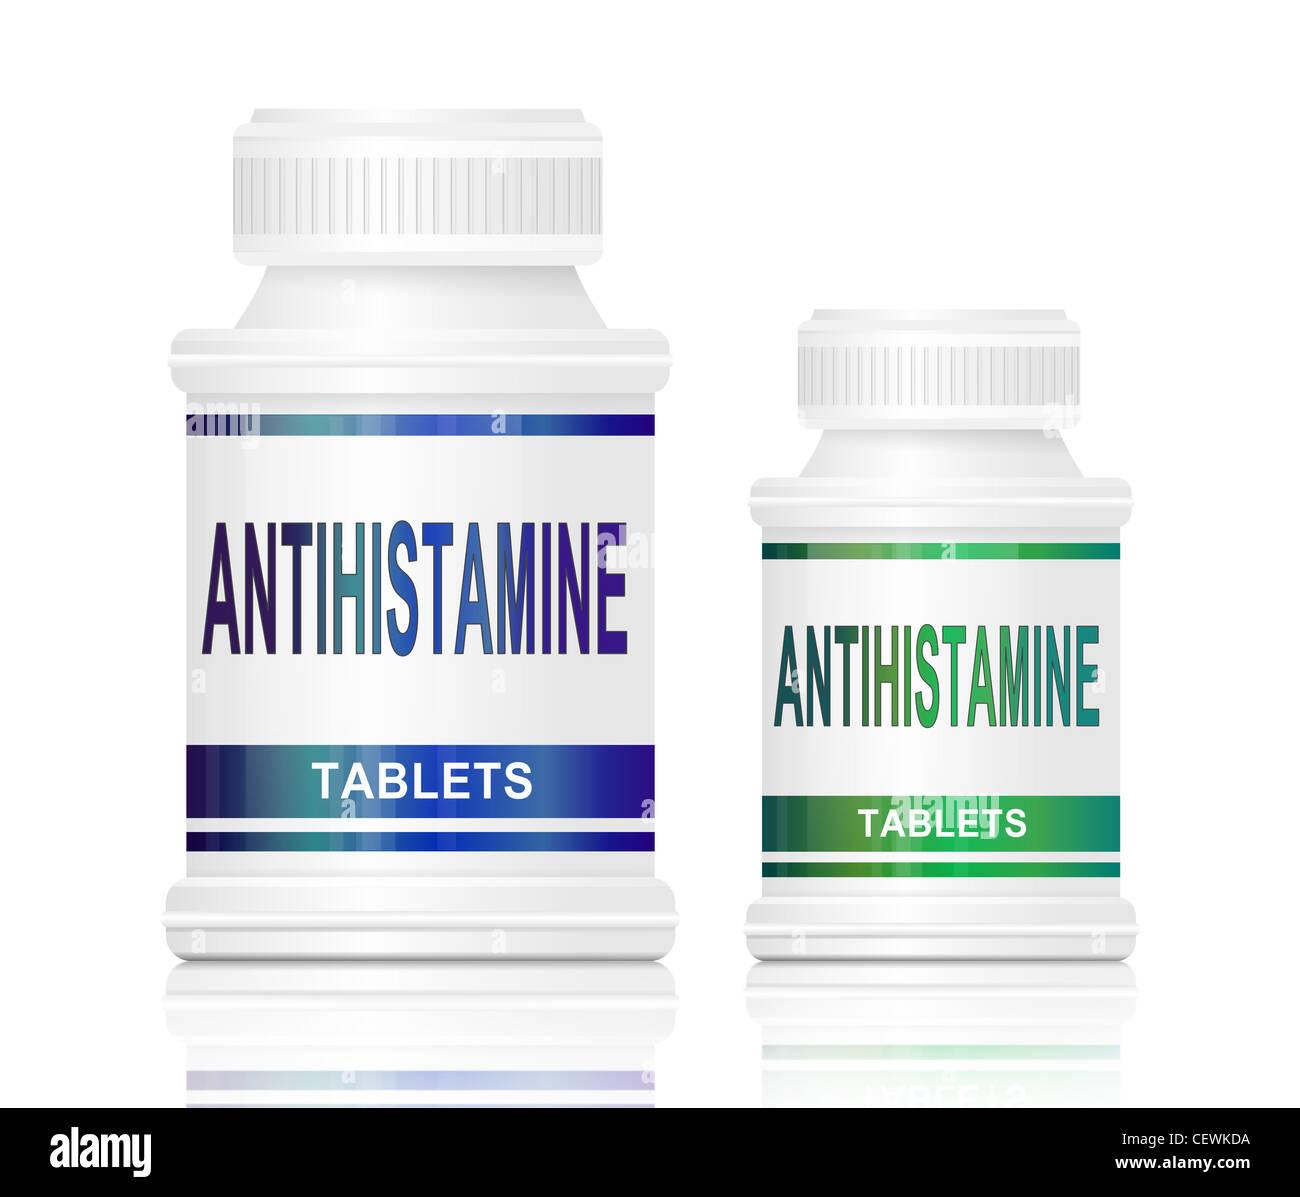 Antihistamine tablets. - Stock Image